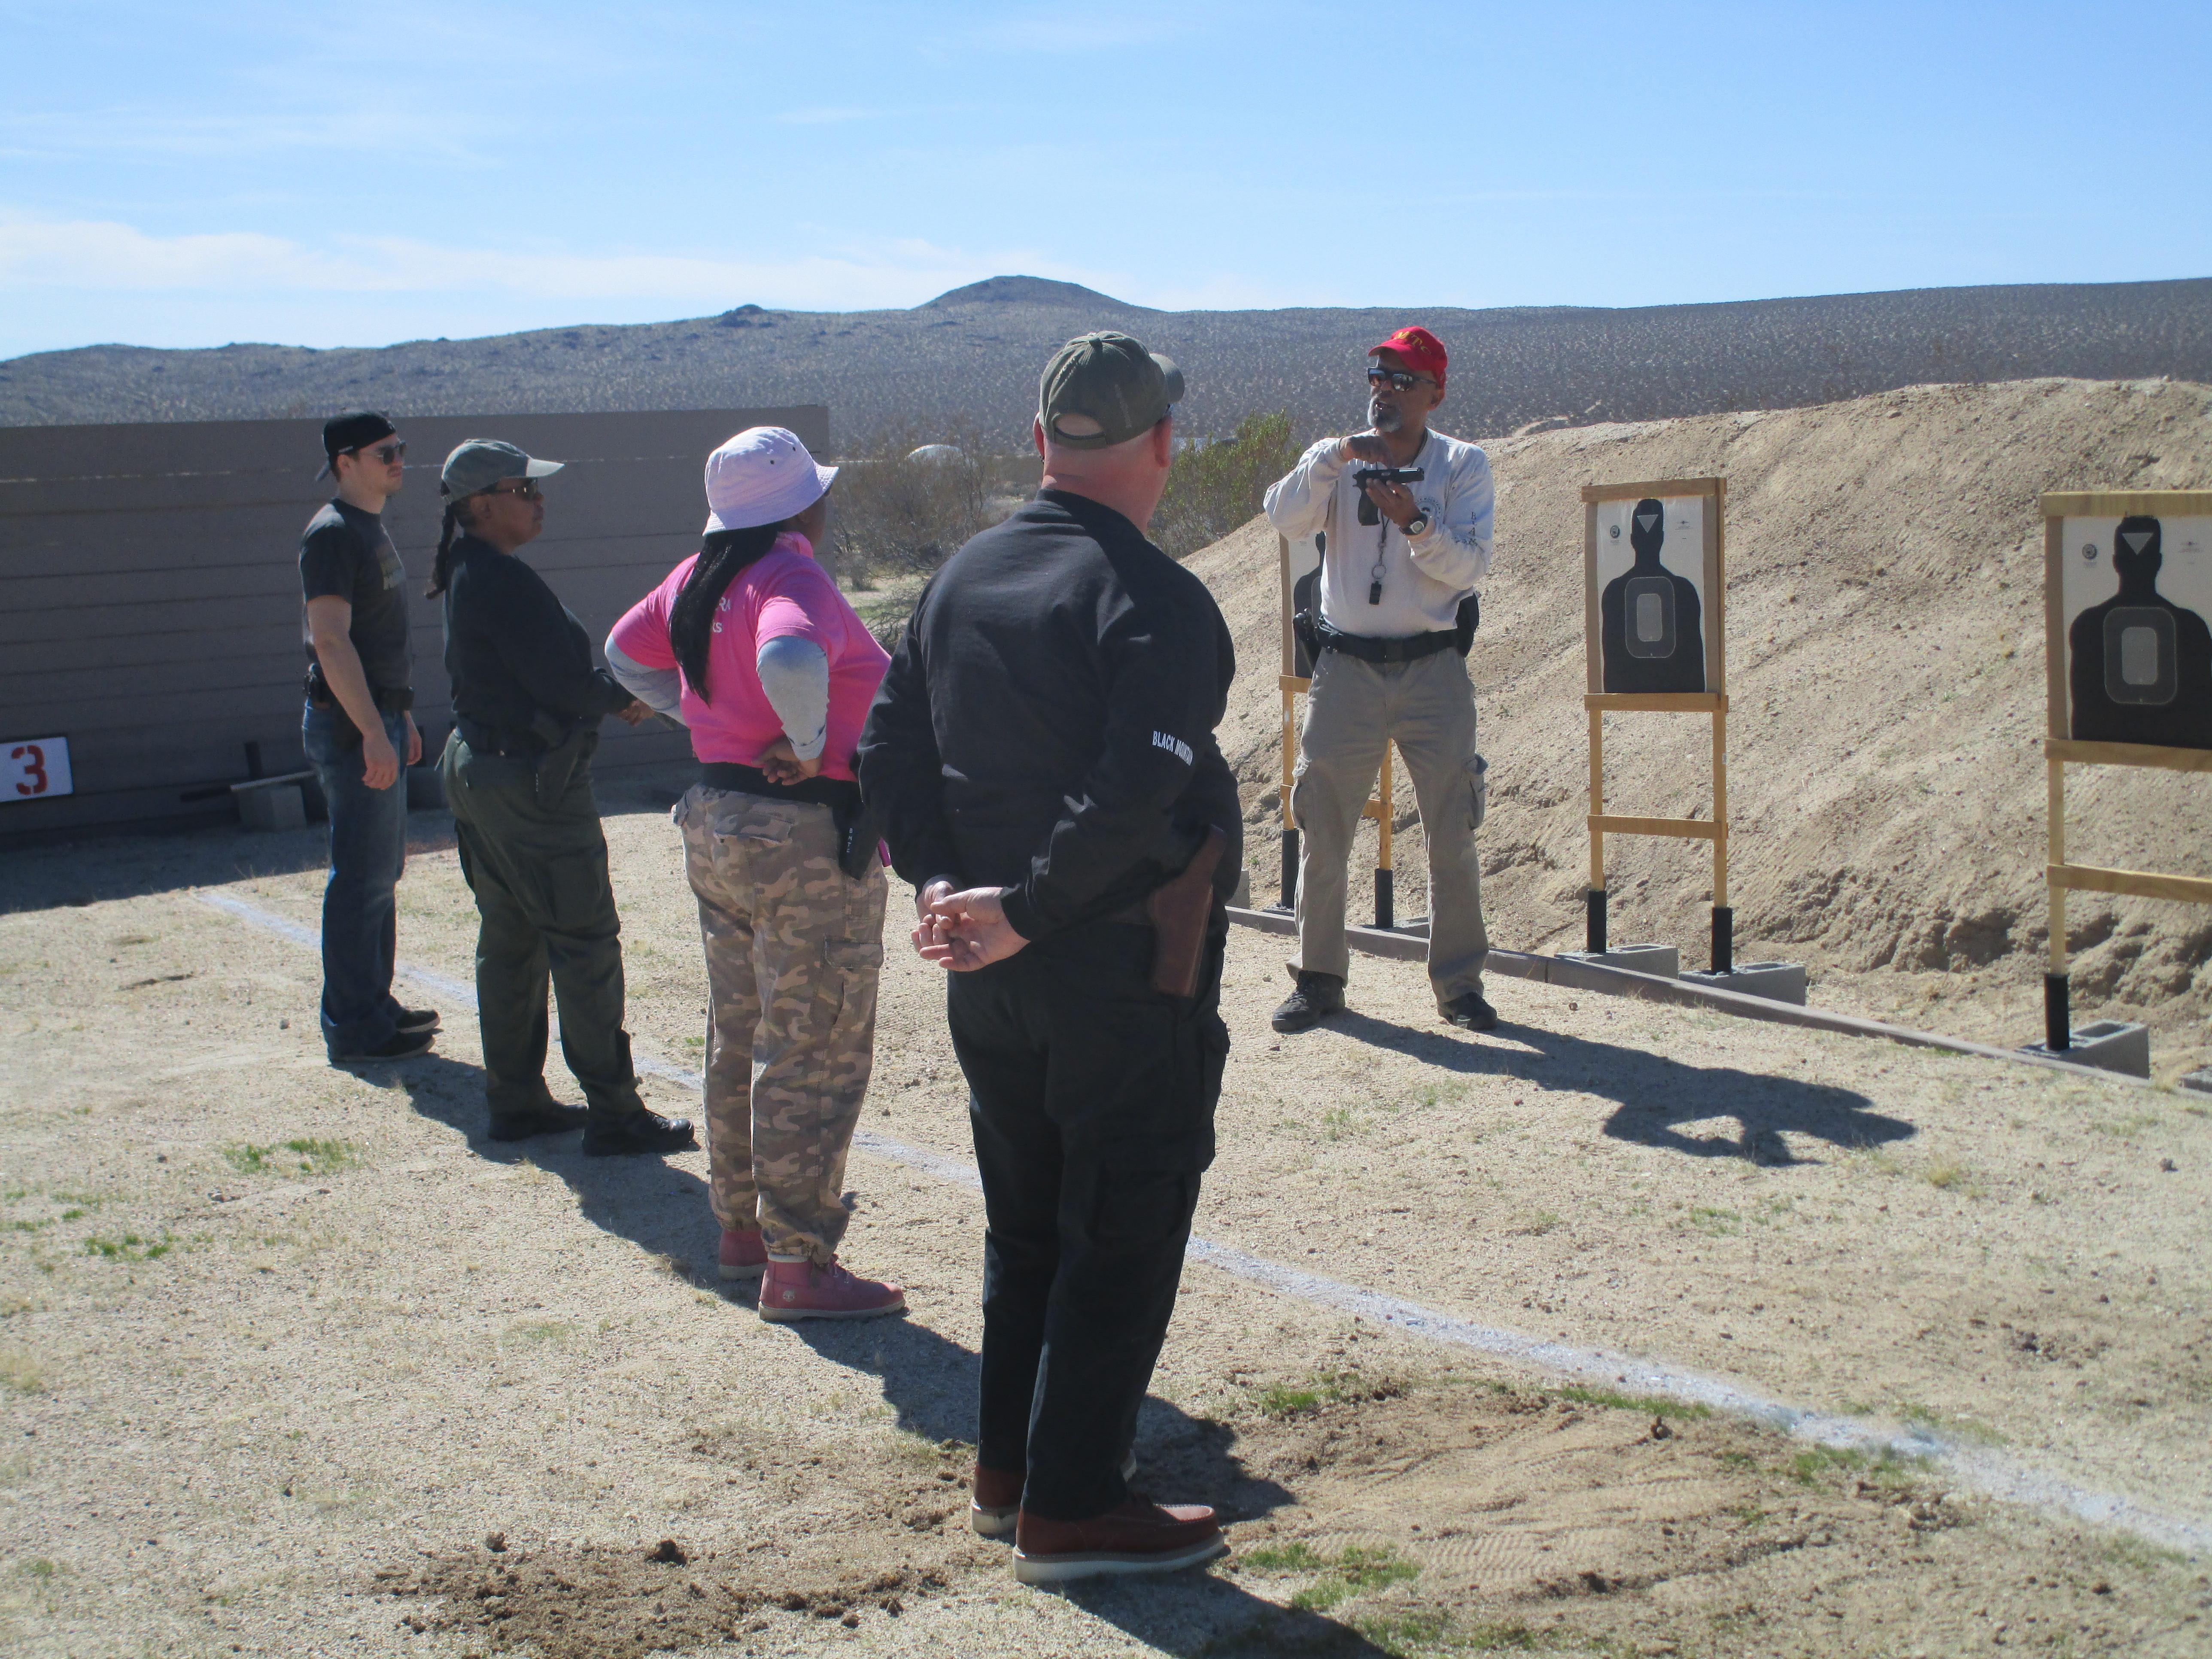 Defensive Handgun/Personal Security I